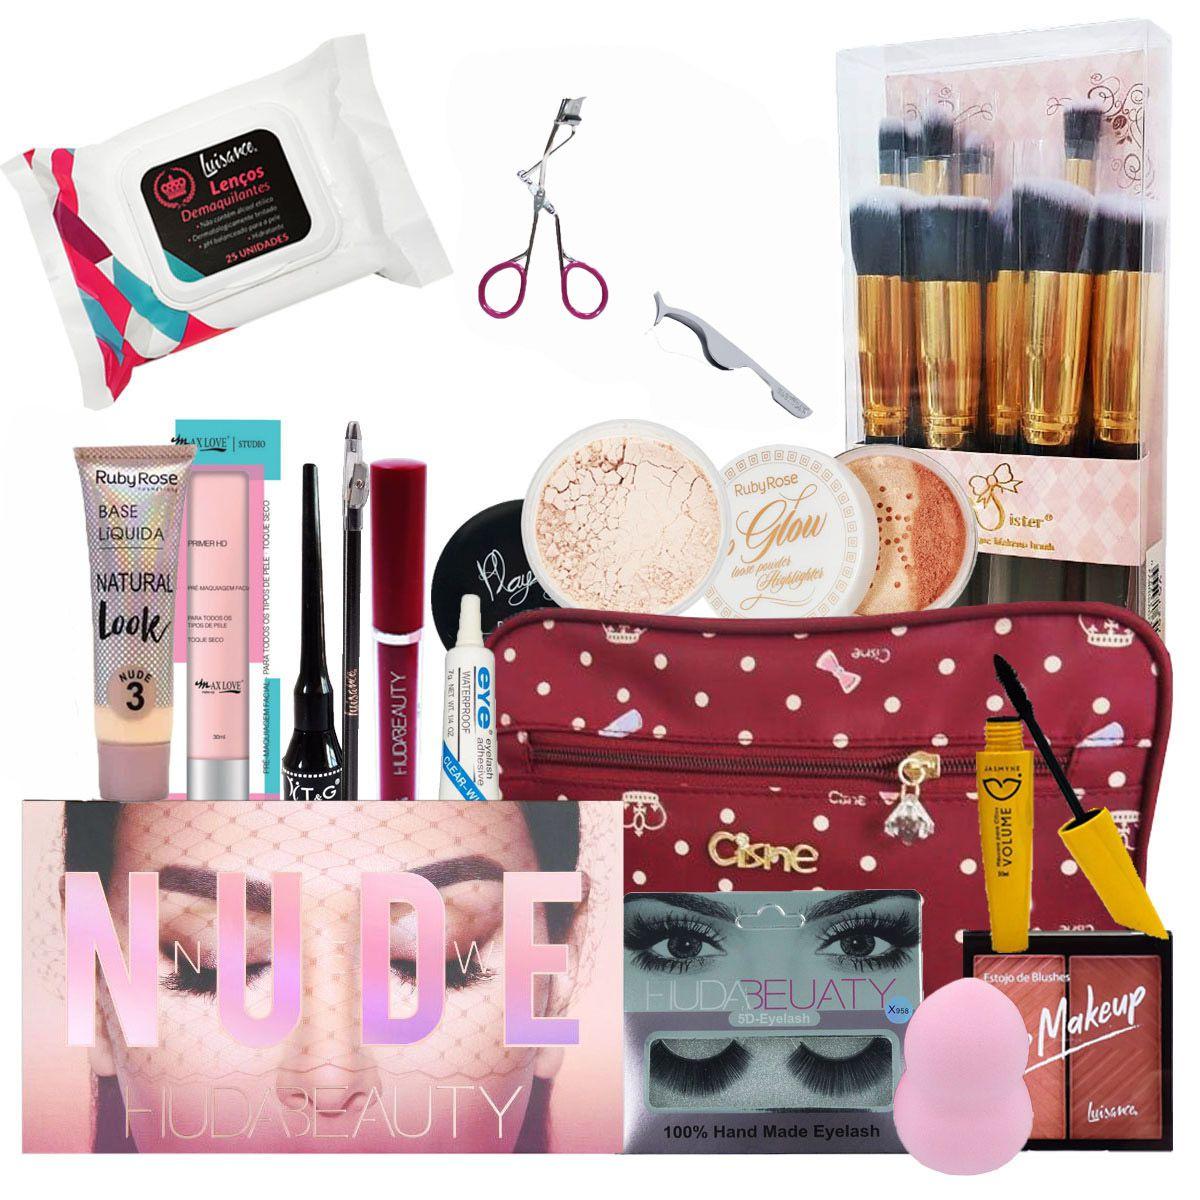 Kit Maquiagem Completo Huda Beauty - 27 Itens C/ BRINDES